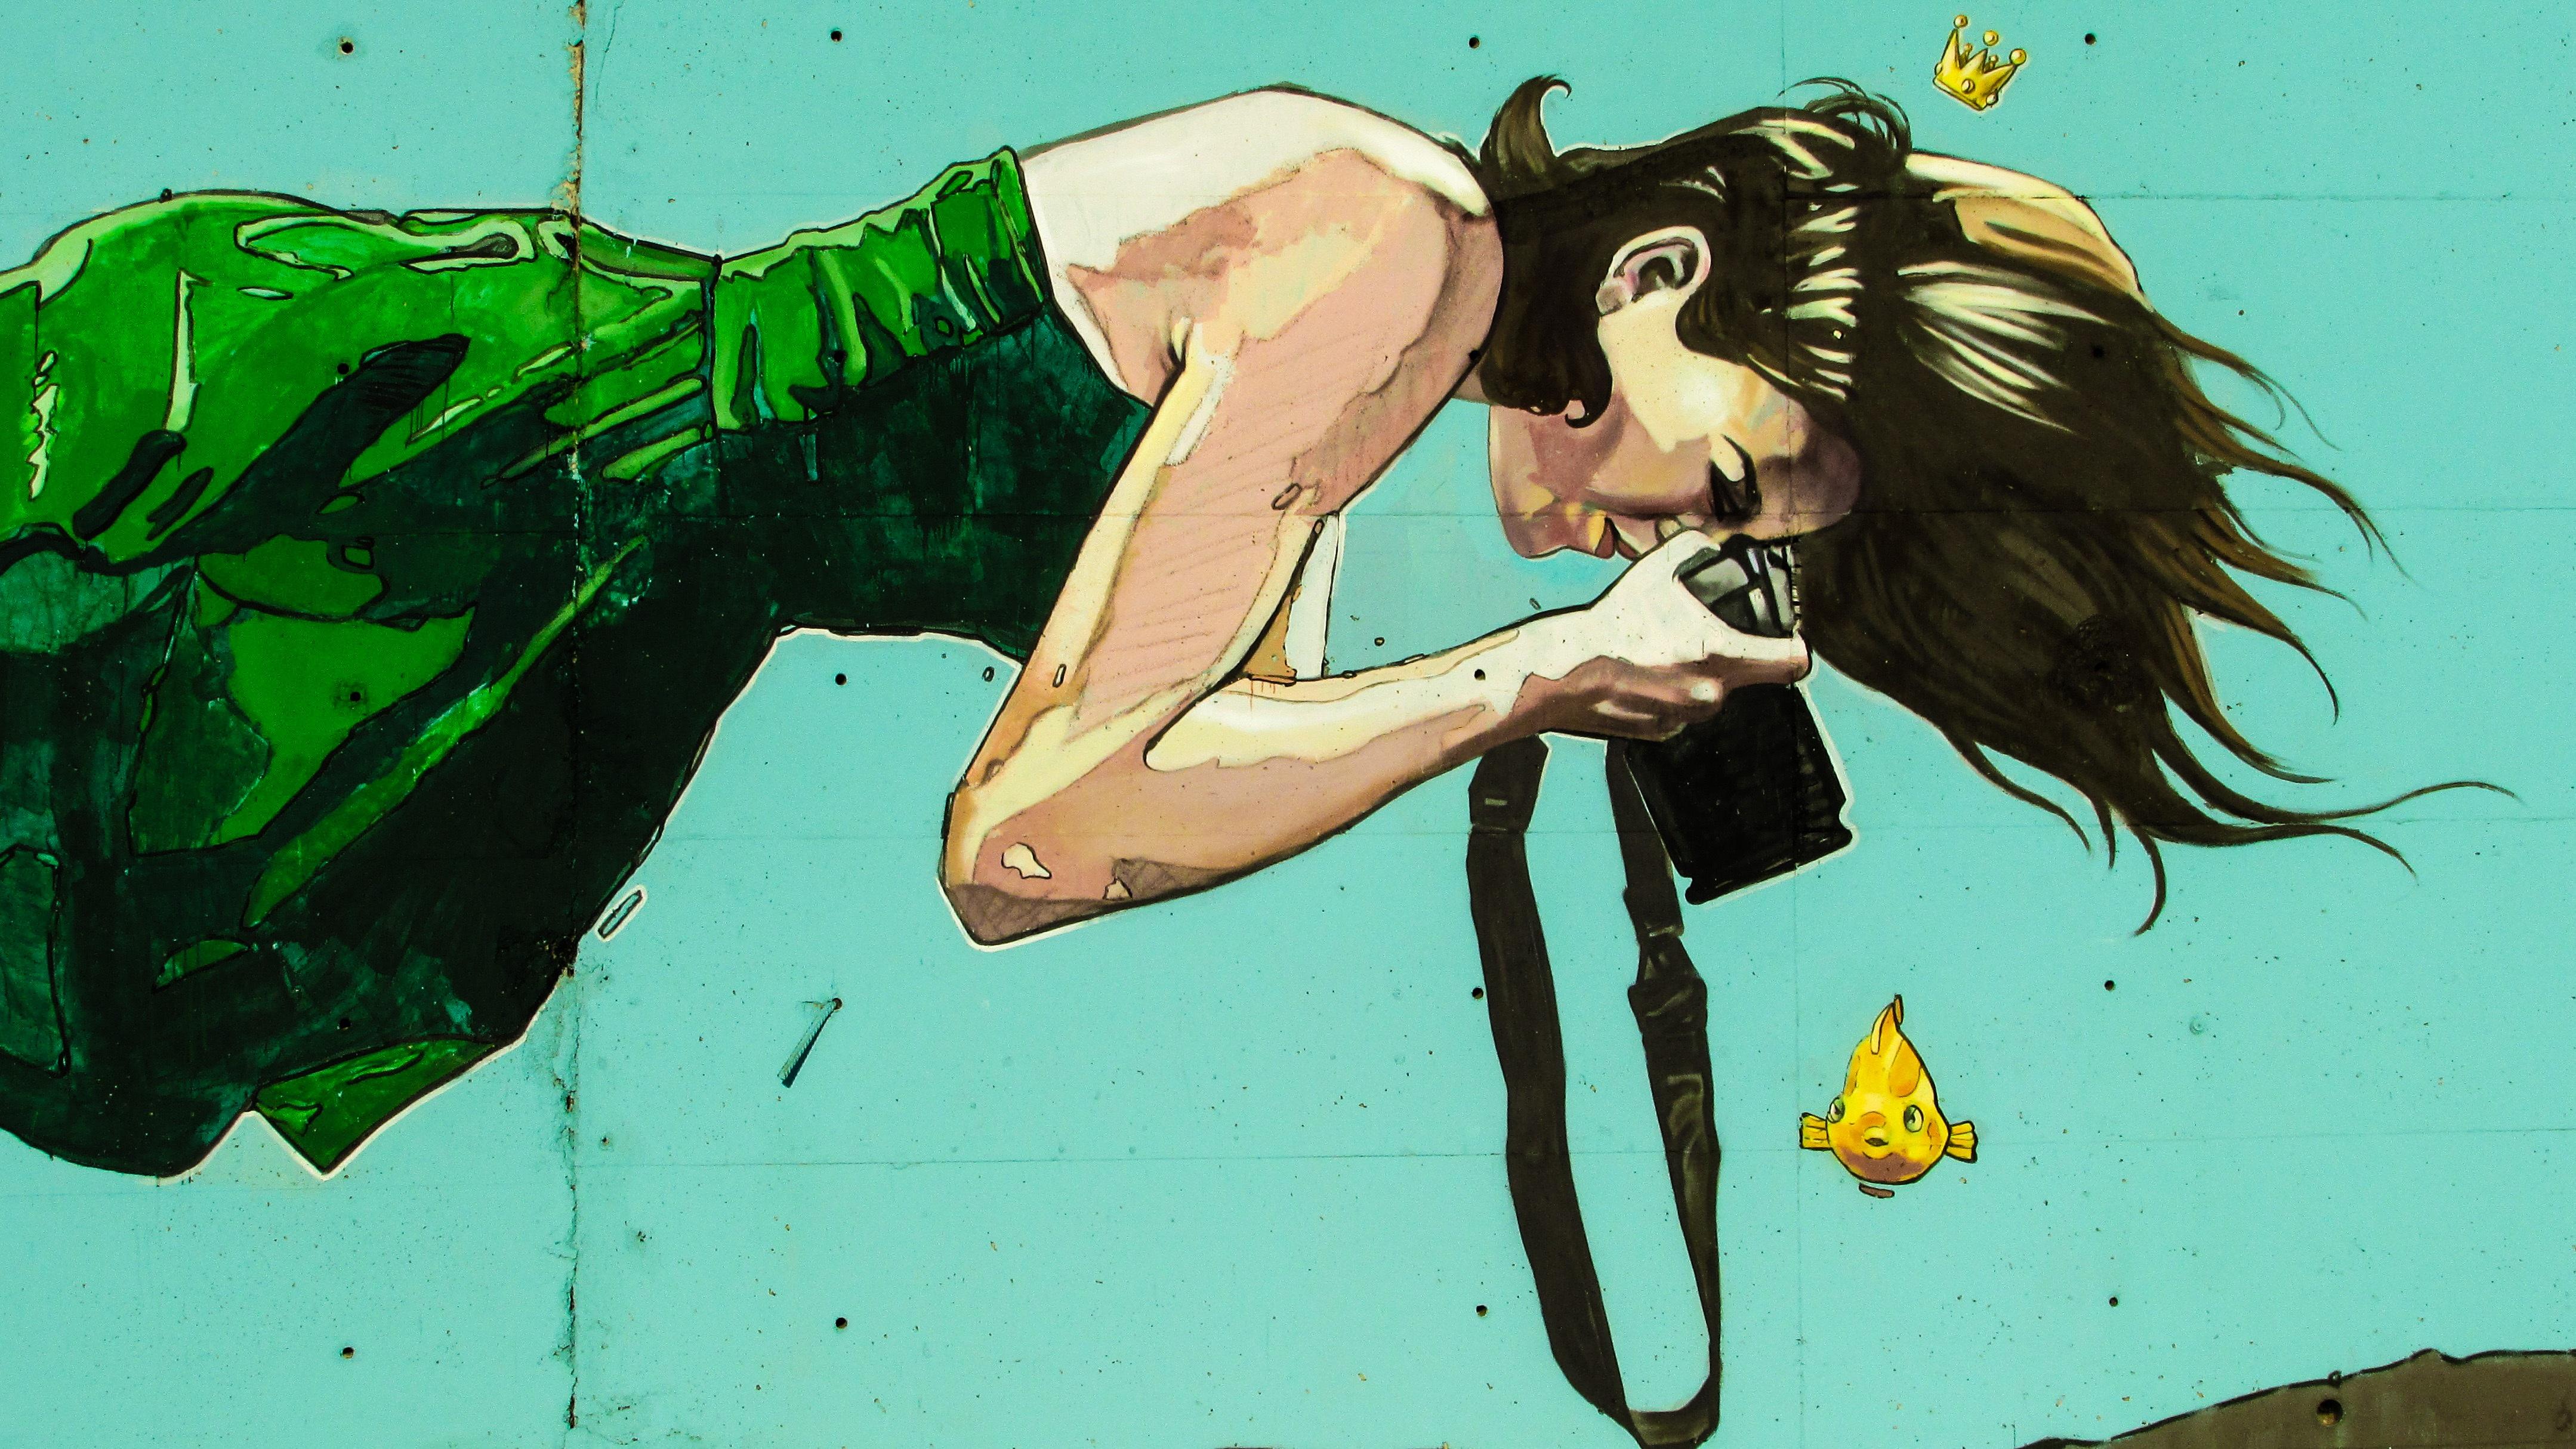 Woman Photographer Floating Colorful Graffiti Illustration Redhead Anime Cyprus Cartoon Paralimni